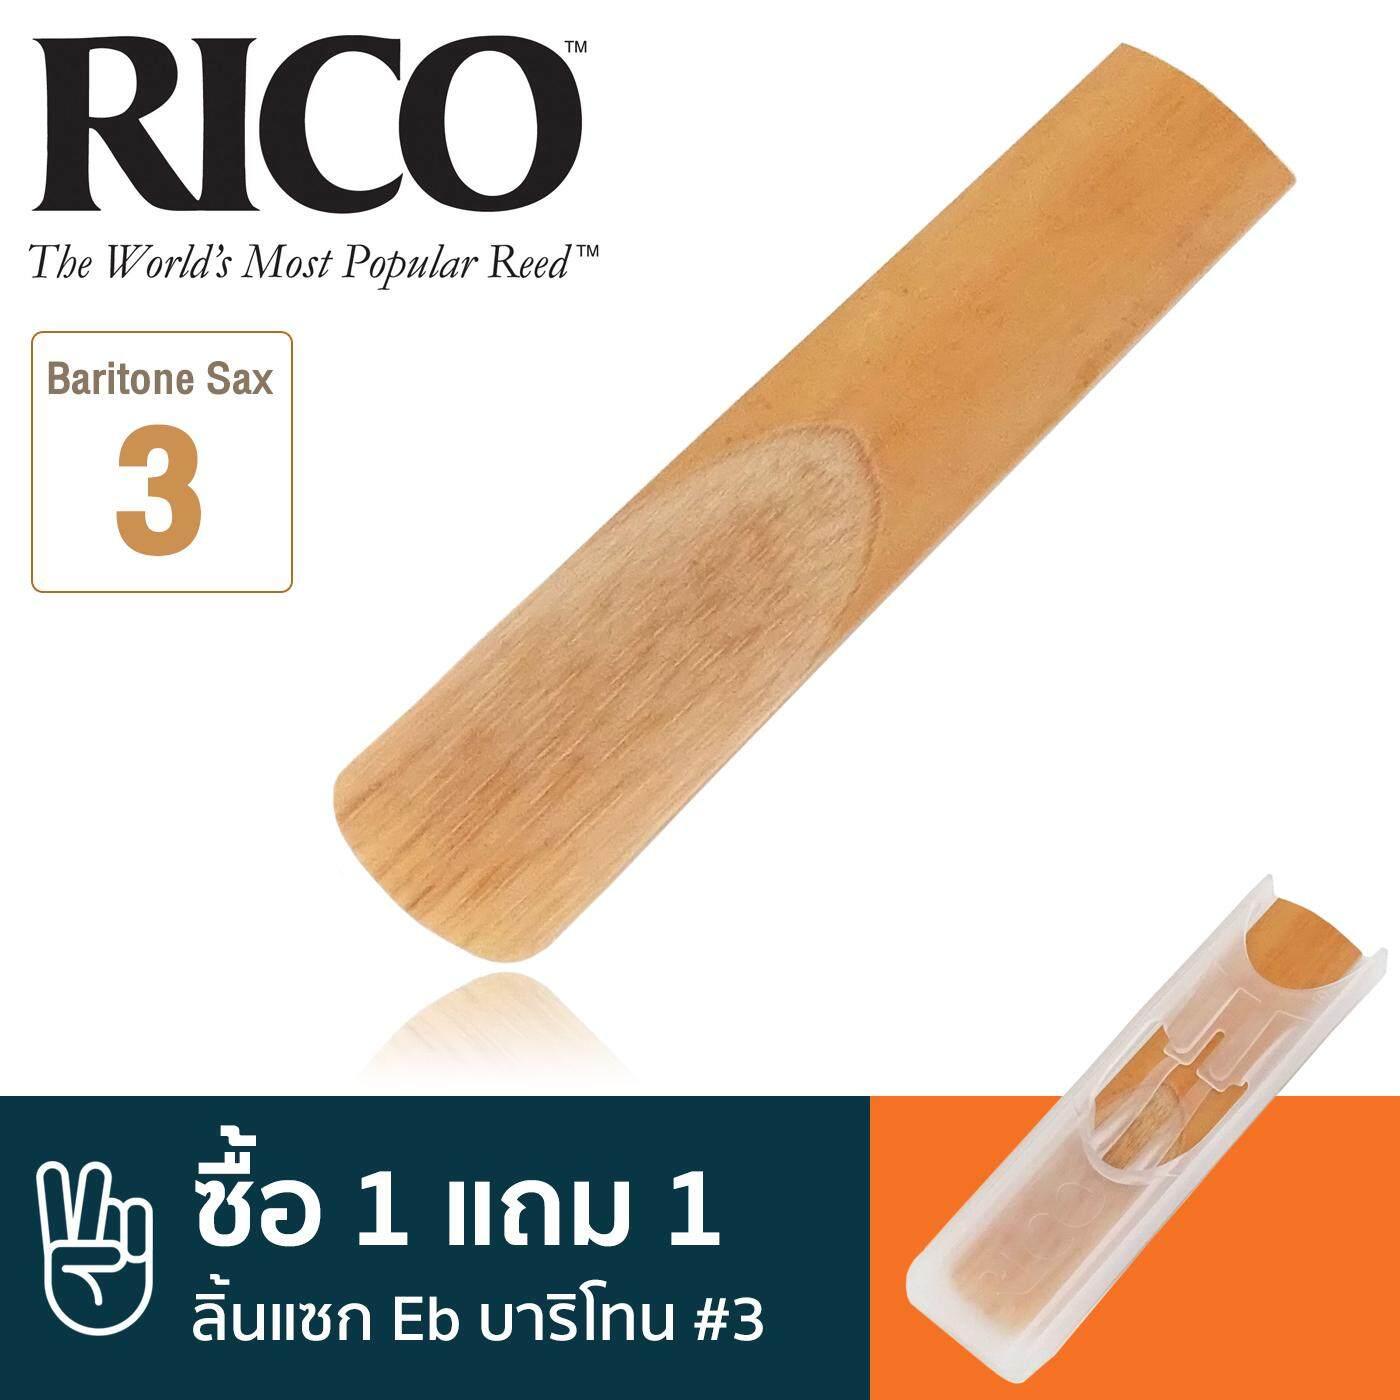 Rico™ ลิ้นแซกโซโฟน บาริโทน เบอร์ 3 (ลิ้นบาริโทนแซก เบอร์ 3, 3 Eb Baritone Sax Reed) ** ซื้อ 1 แถม 1 ** By Rala Music.